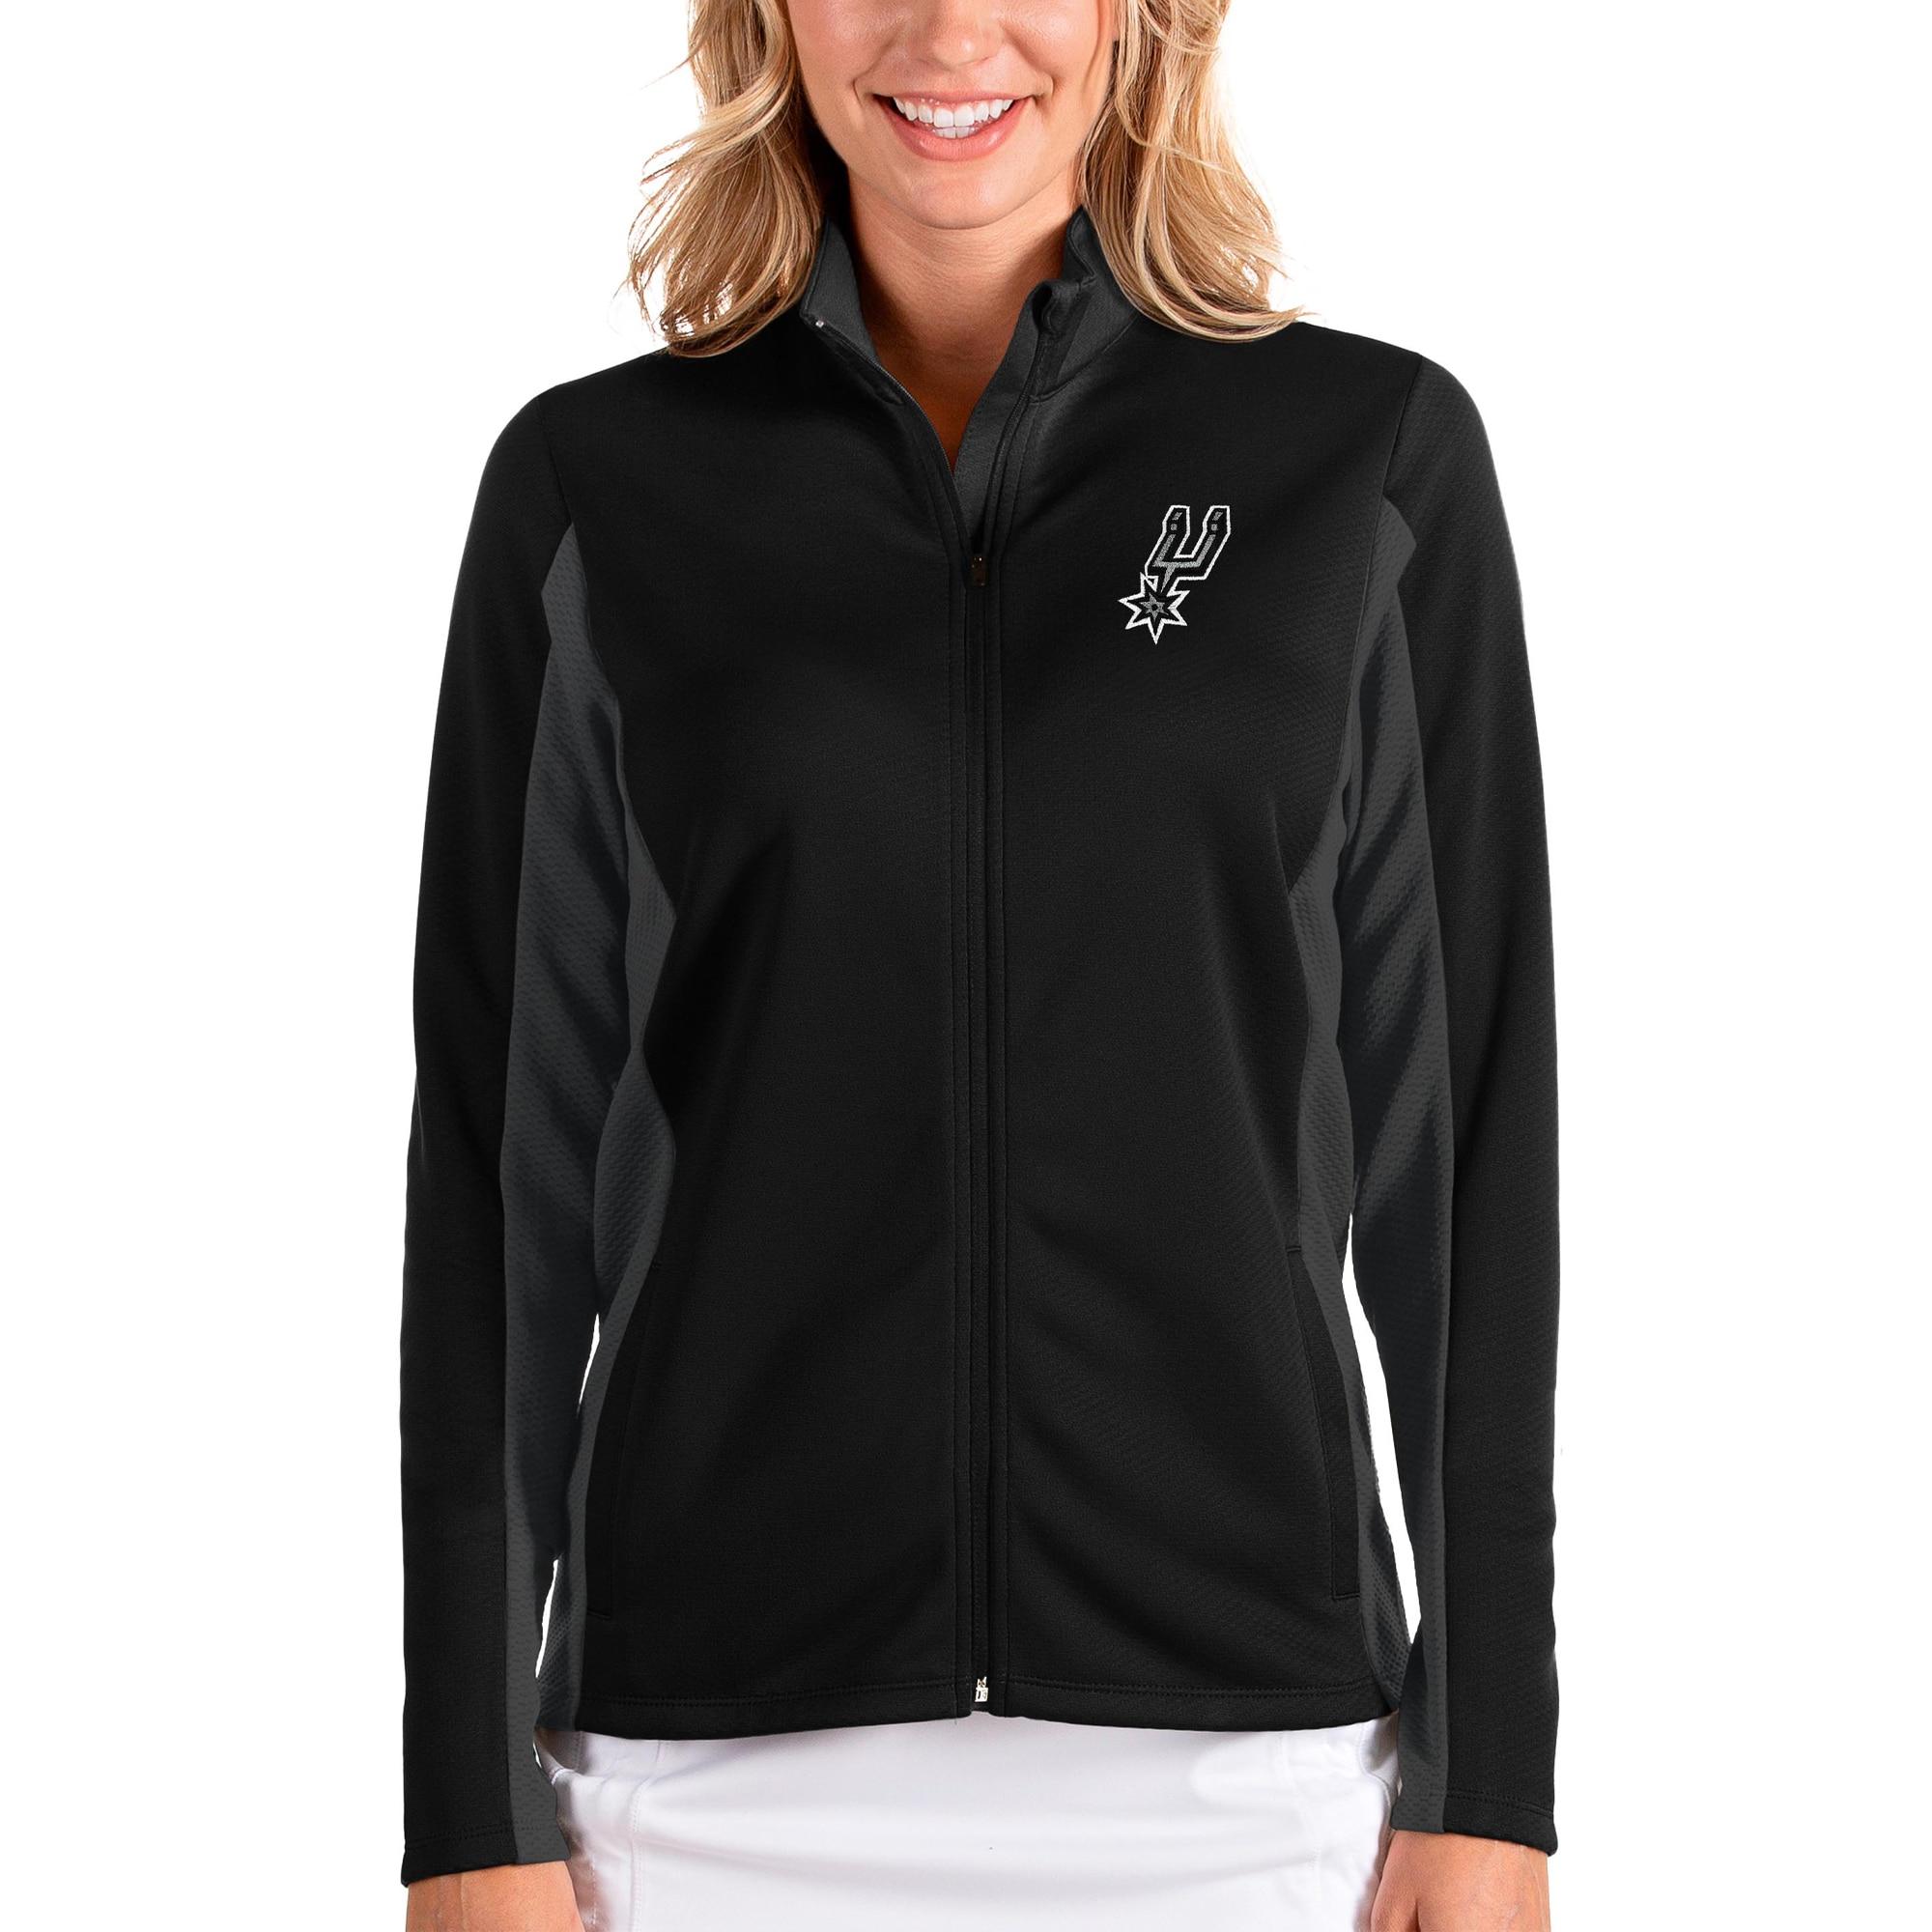 San Antonio Spurs Antigua Women's Passage Full-Zip Jacket - Black/Charcoal